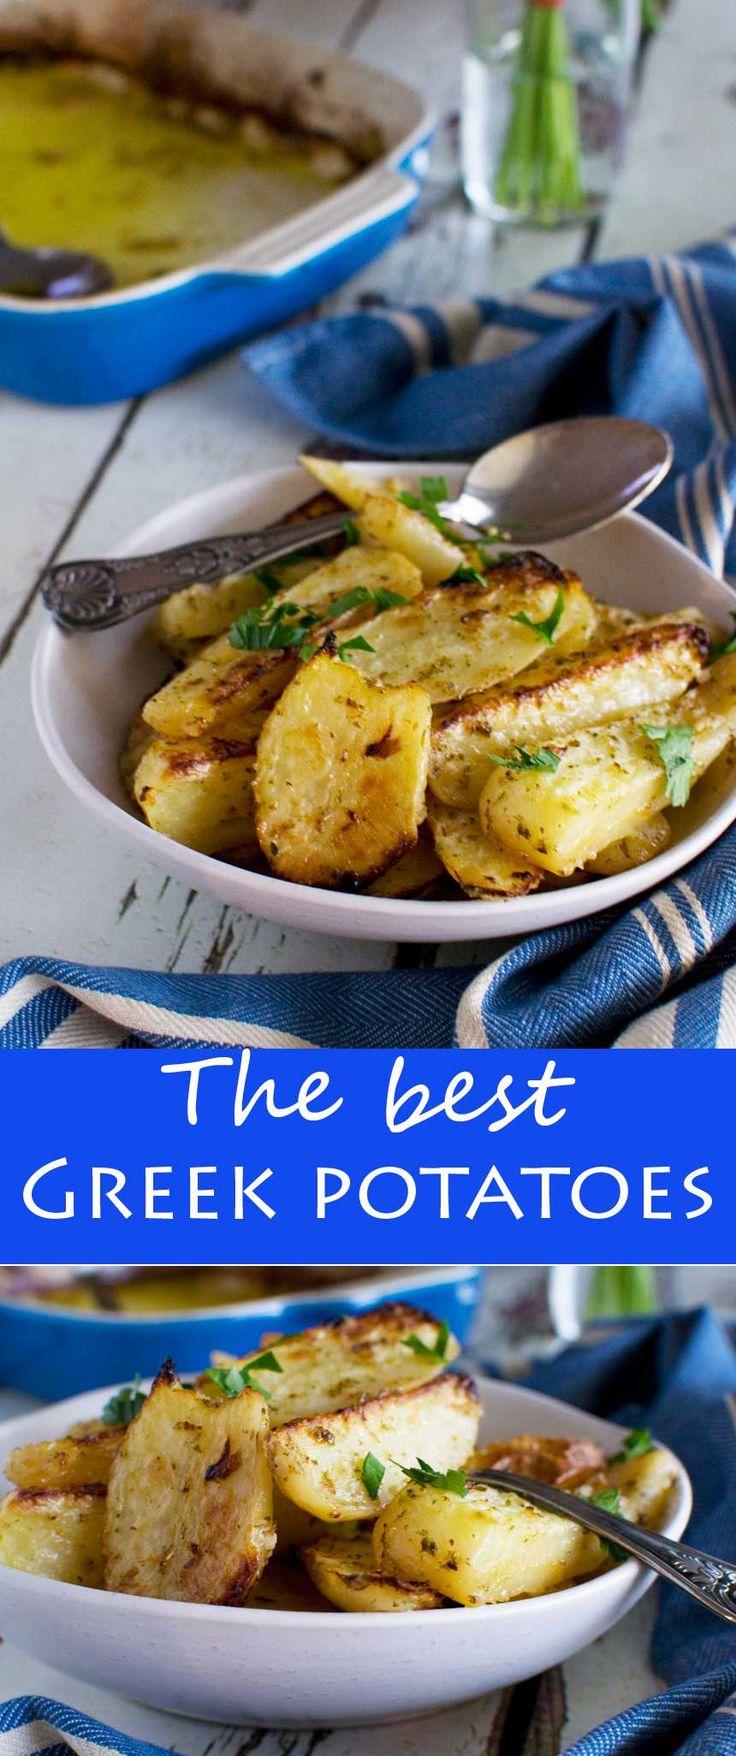 Best 25 best greek food ideas on pinterest recipes with chicken the best greek potatoes greek food recipesvegetarian forumfinder Images